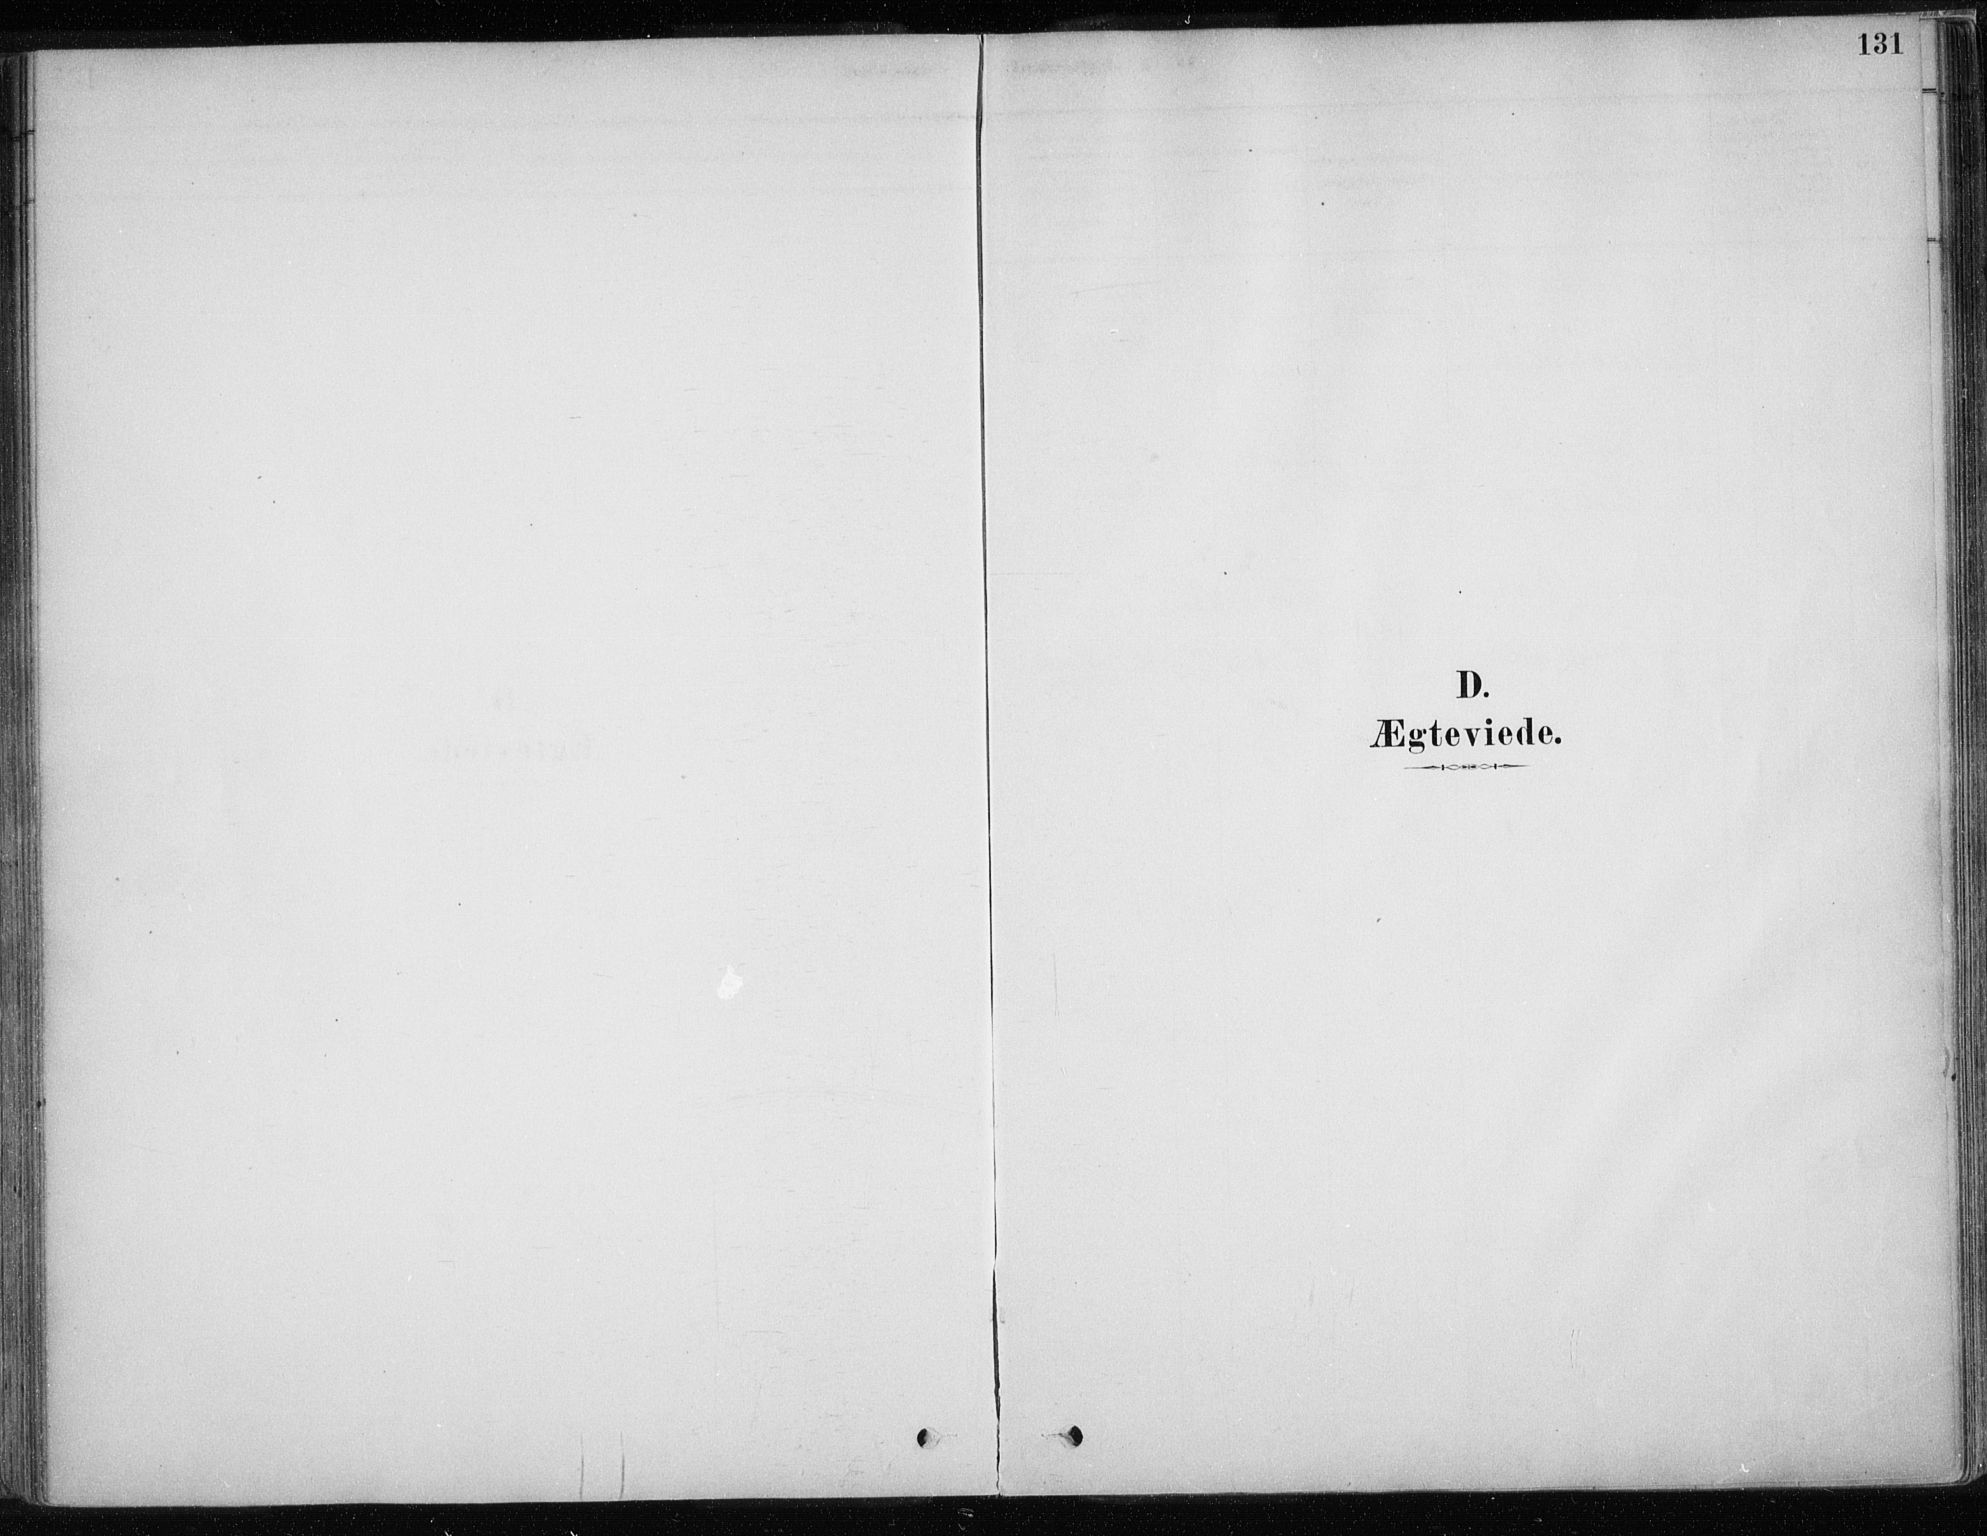 SATØ, Karasjok sokneprestkontor, H/Ha/L0002kirke: Ministerialbok nr. 2, 1885-1906, s. 131